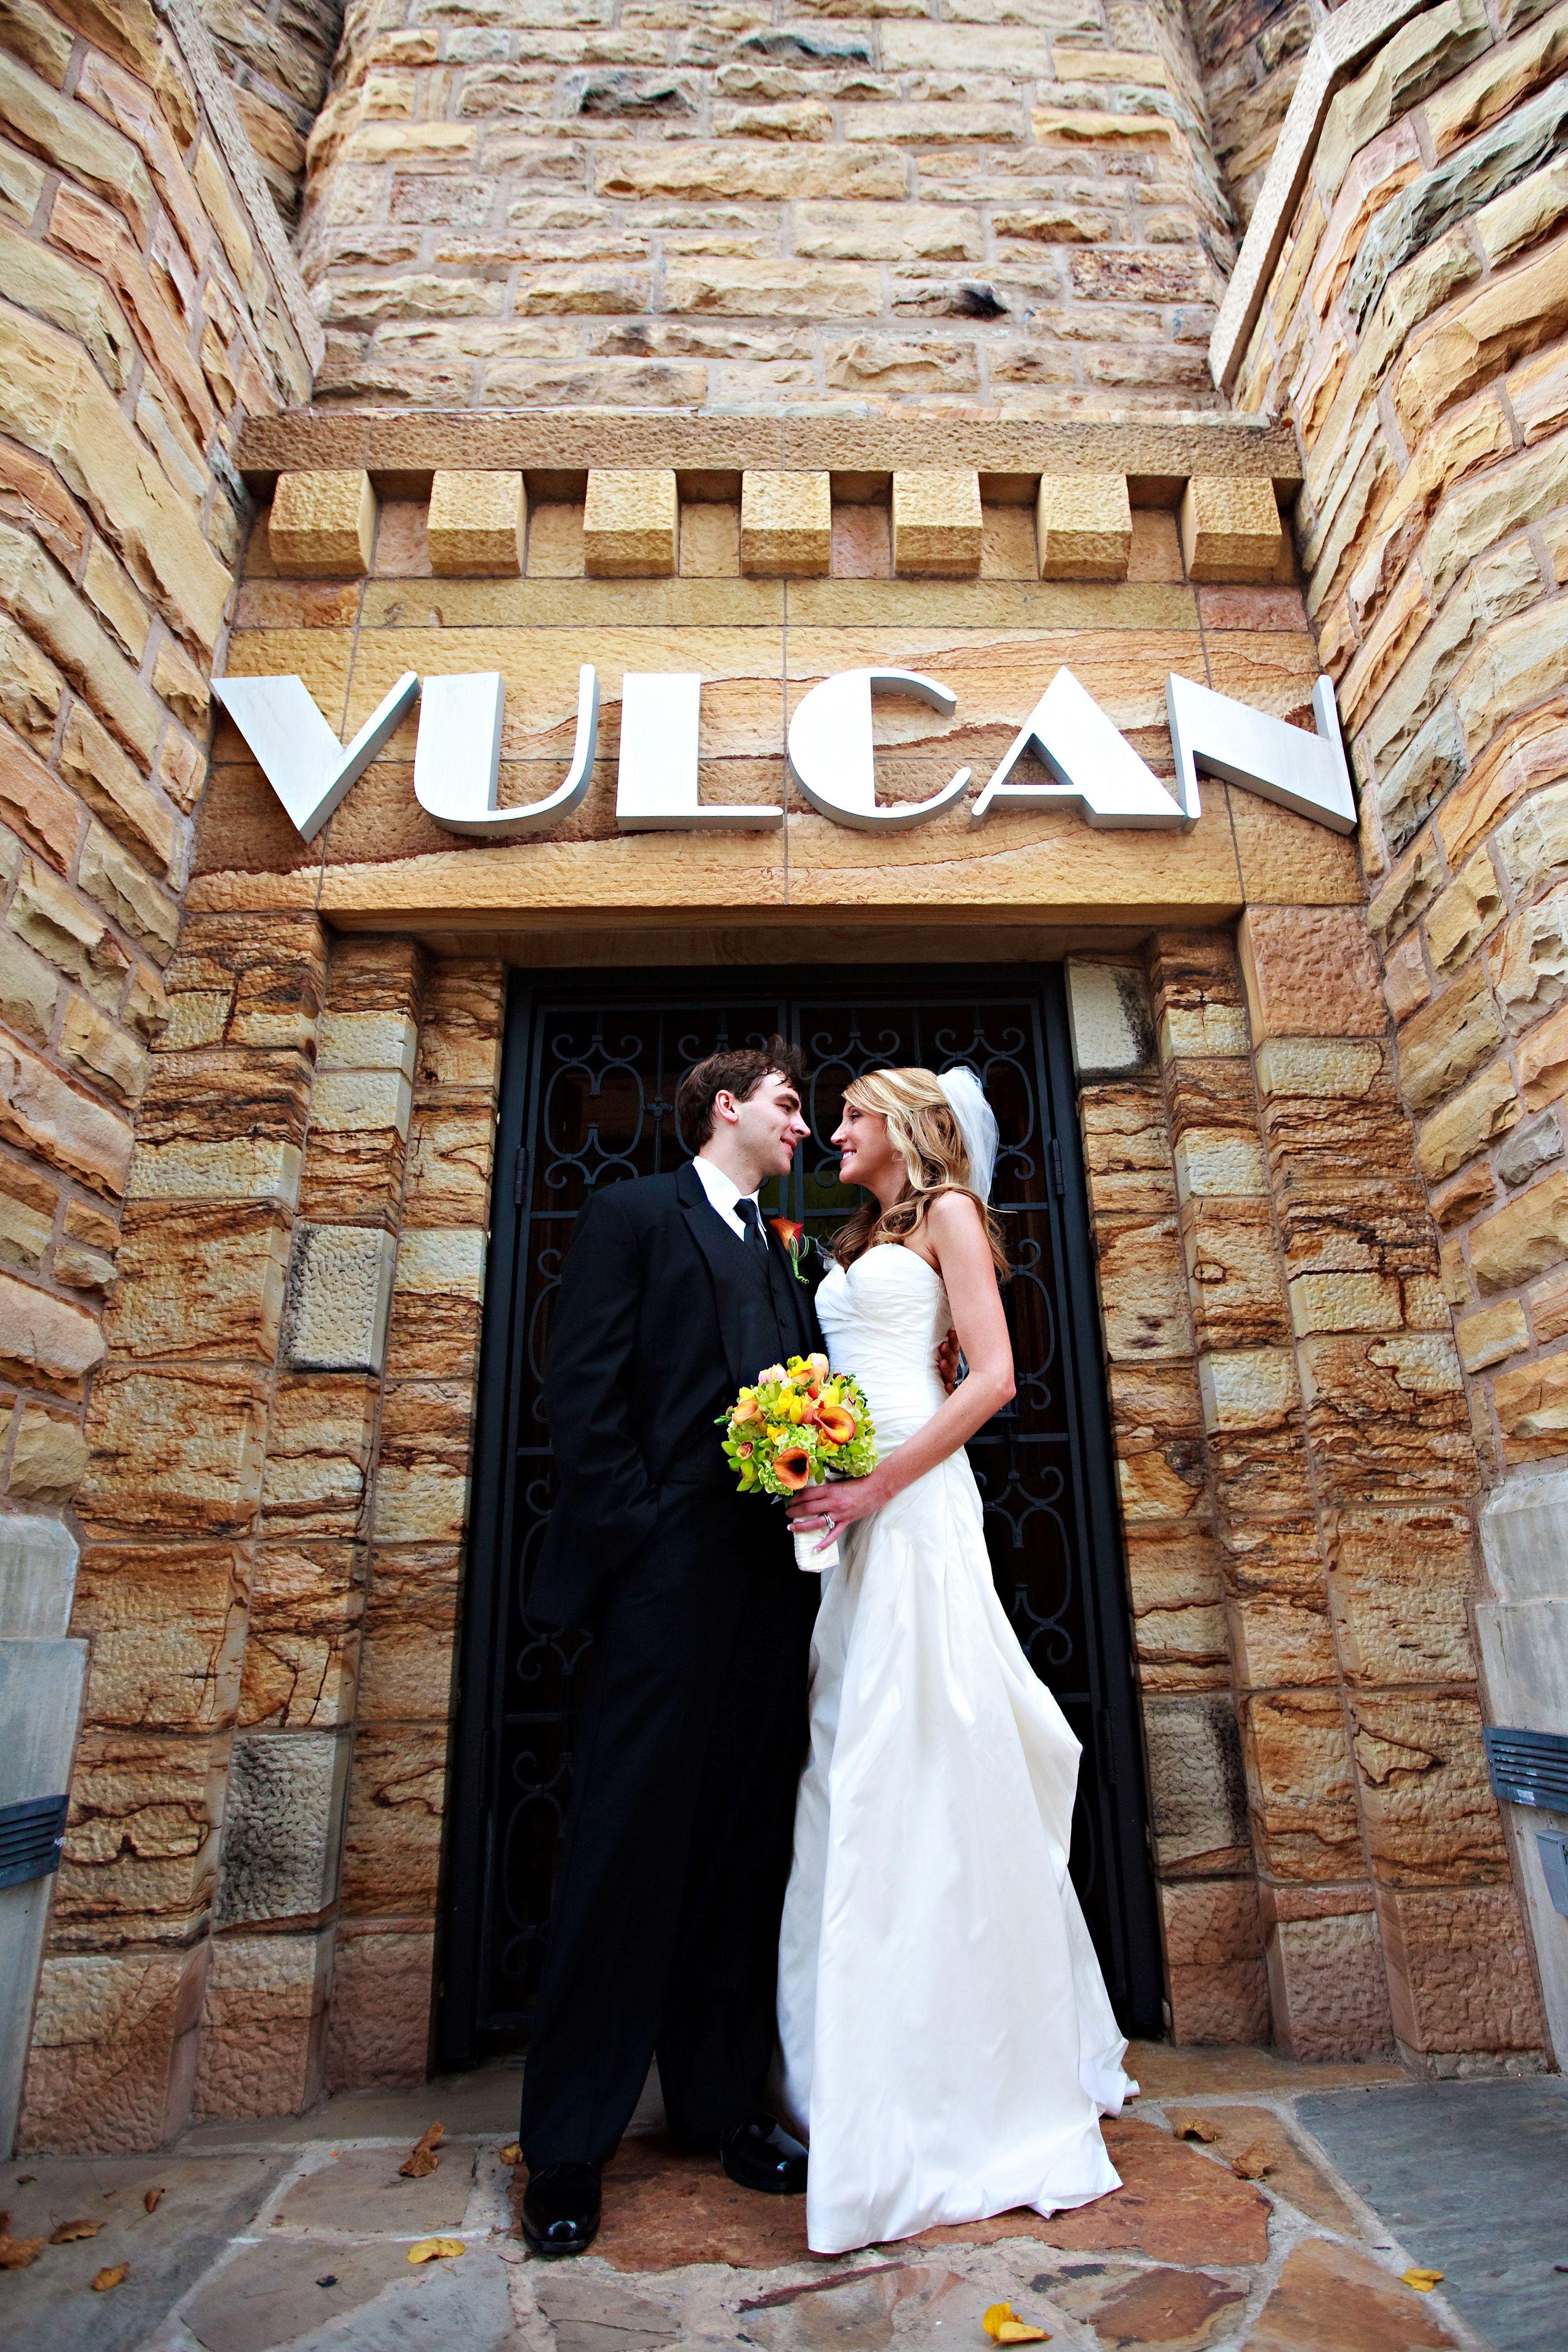 Wedding at Vulcan Park and Museum - Birmingham, AL - Breanna Fog ...